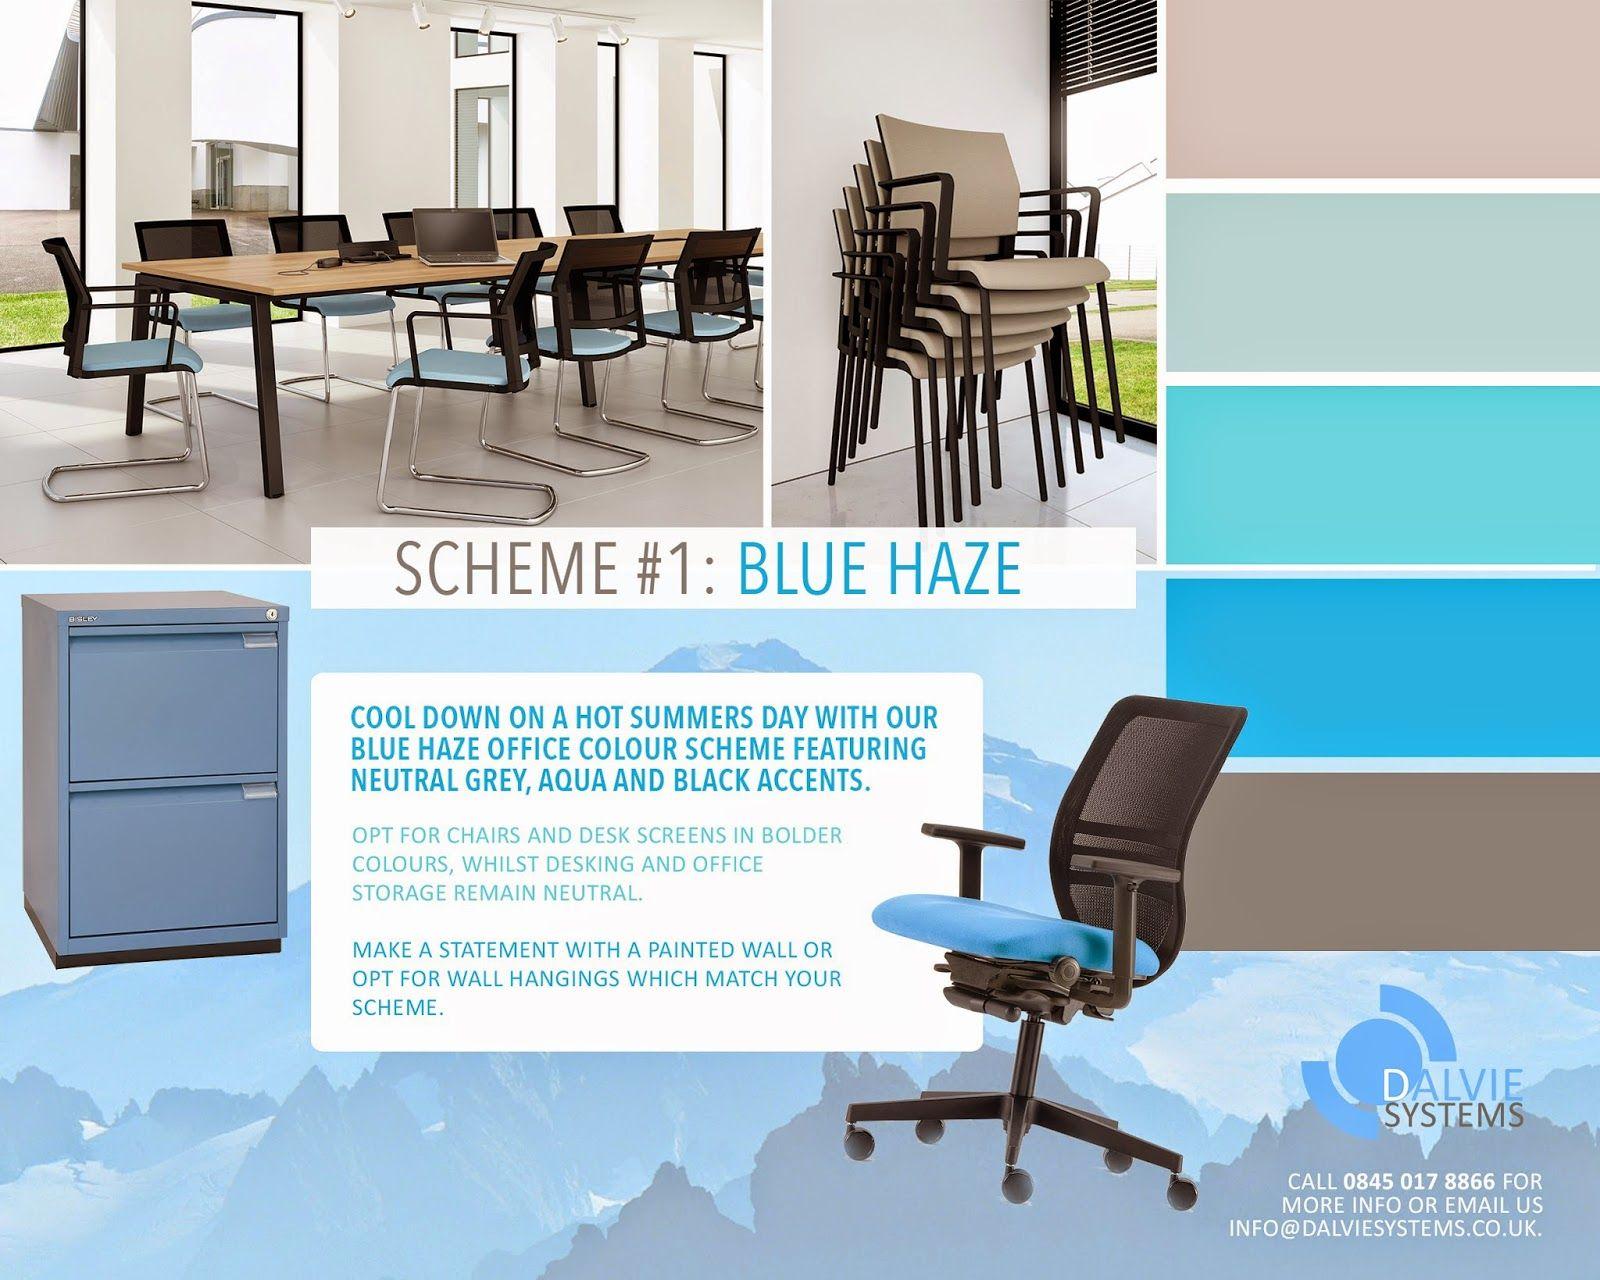 Dalvie Systems Company Blog 5 Summer Office Colour